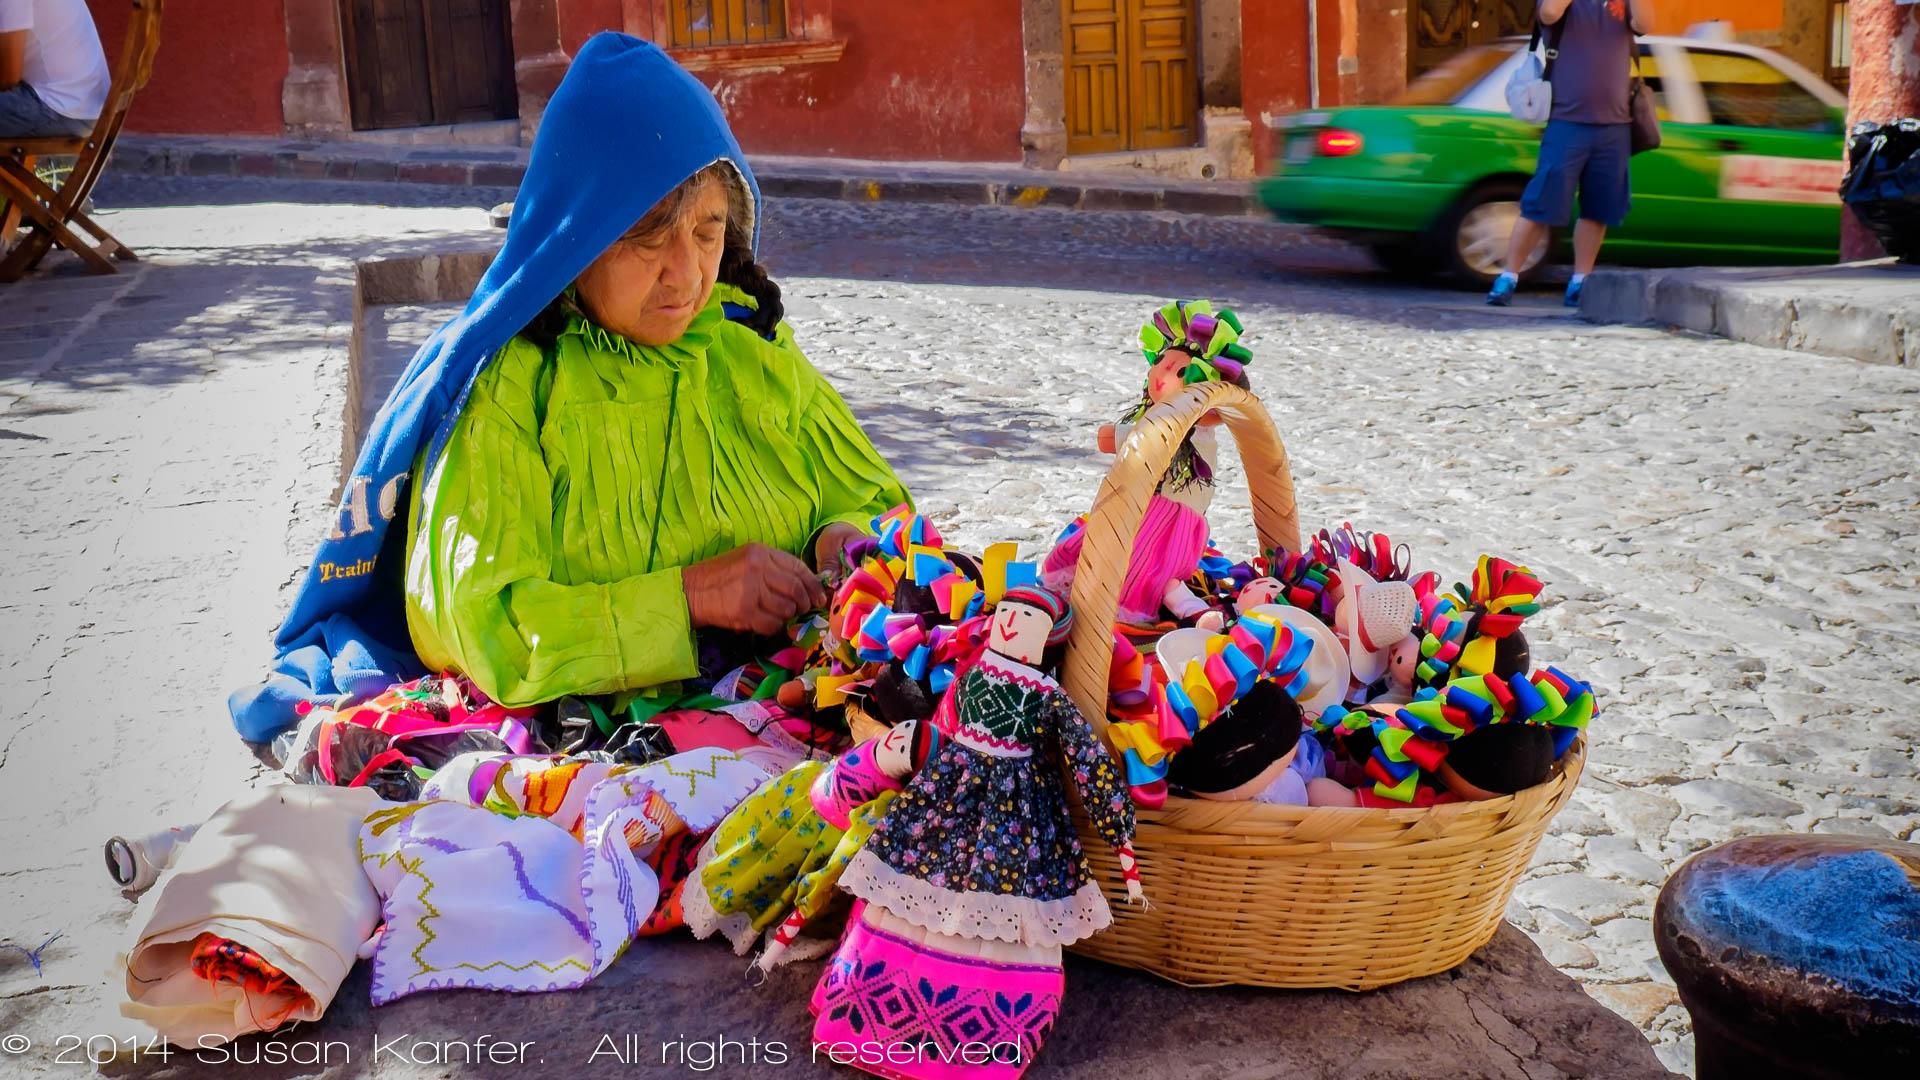 Woman Making Dolls